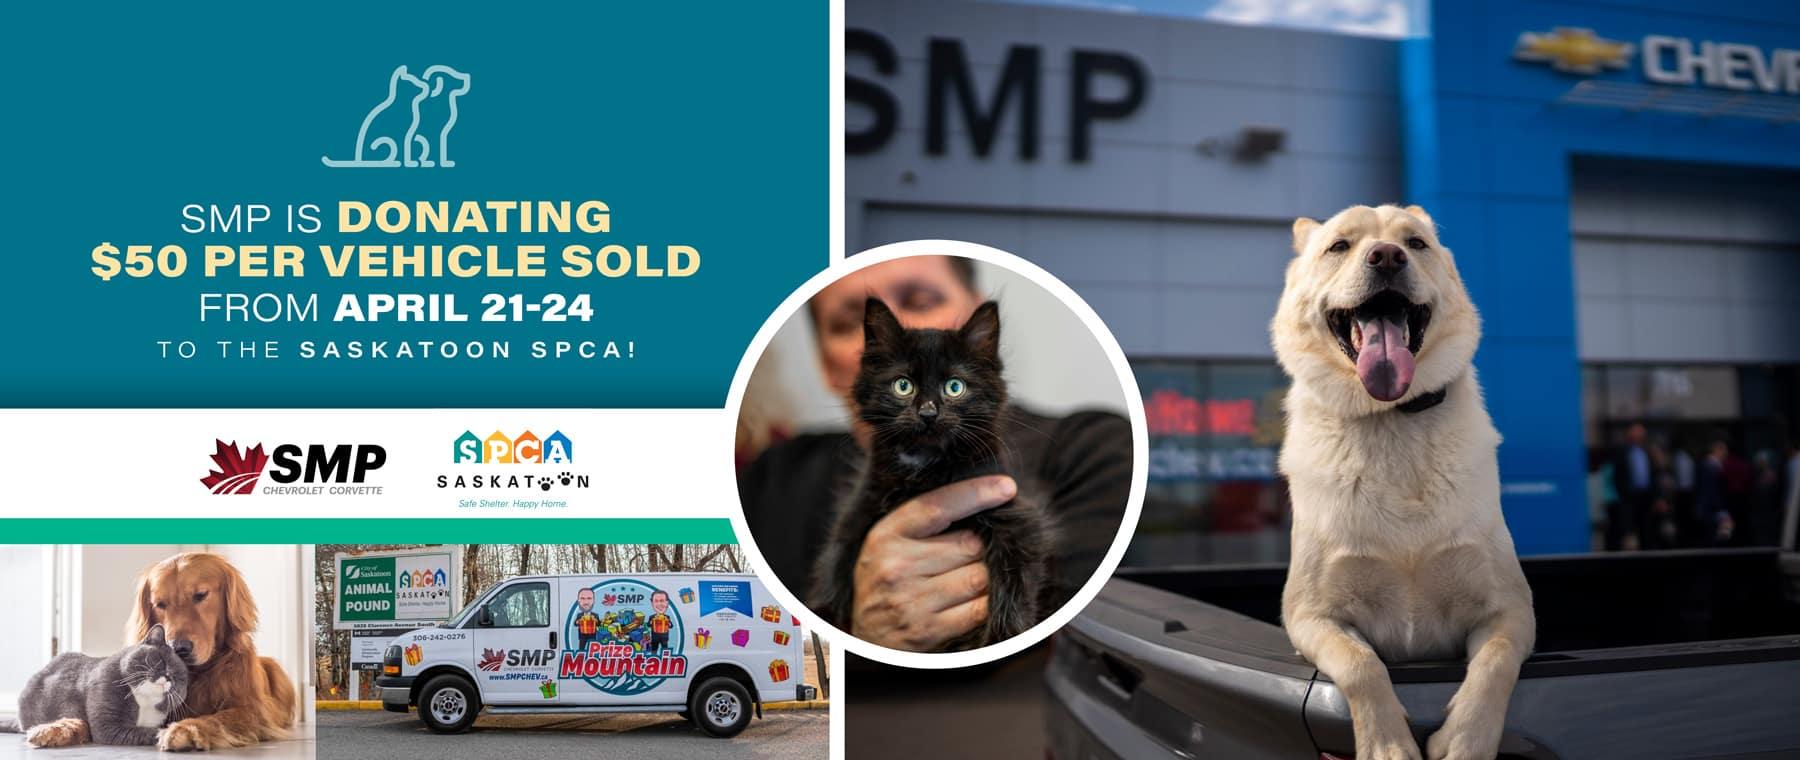 1583100_SMP_April_SPCA-Partner_WB